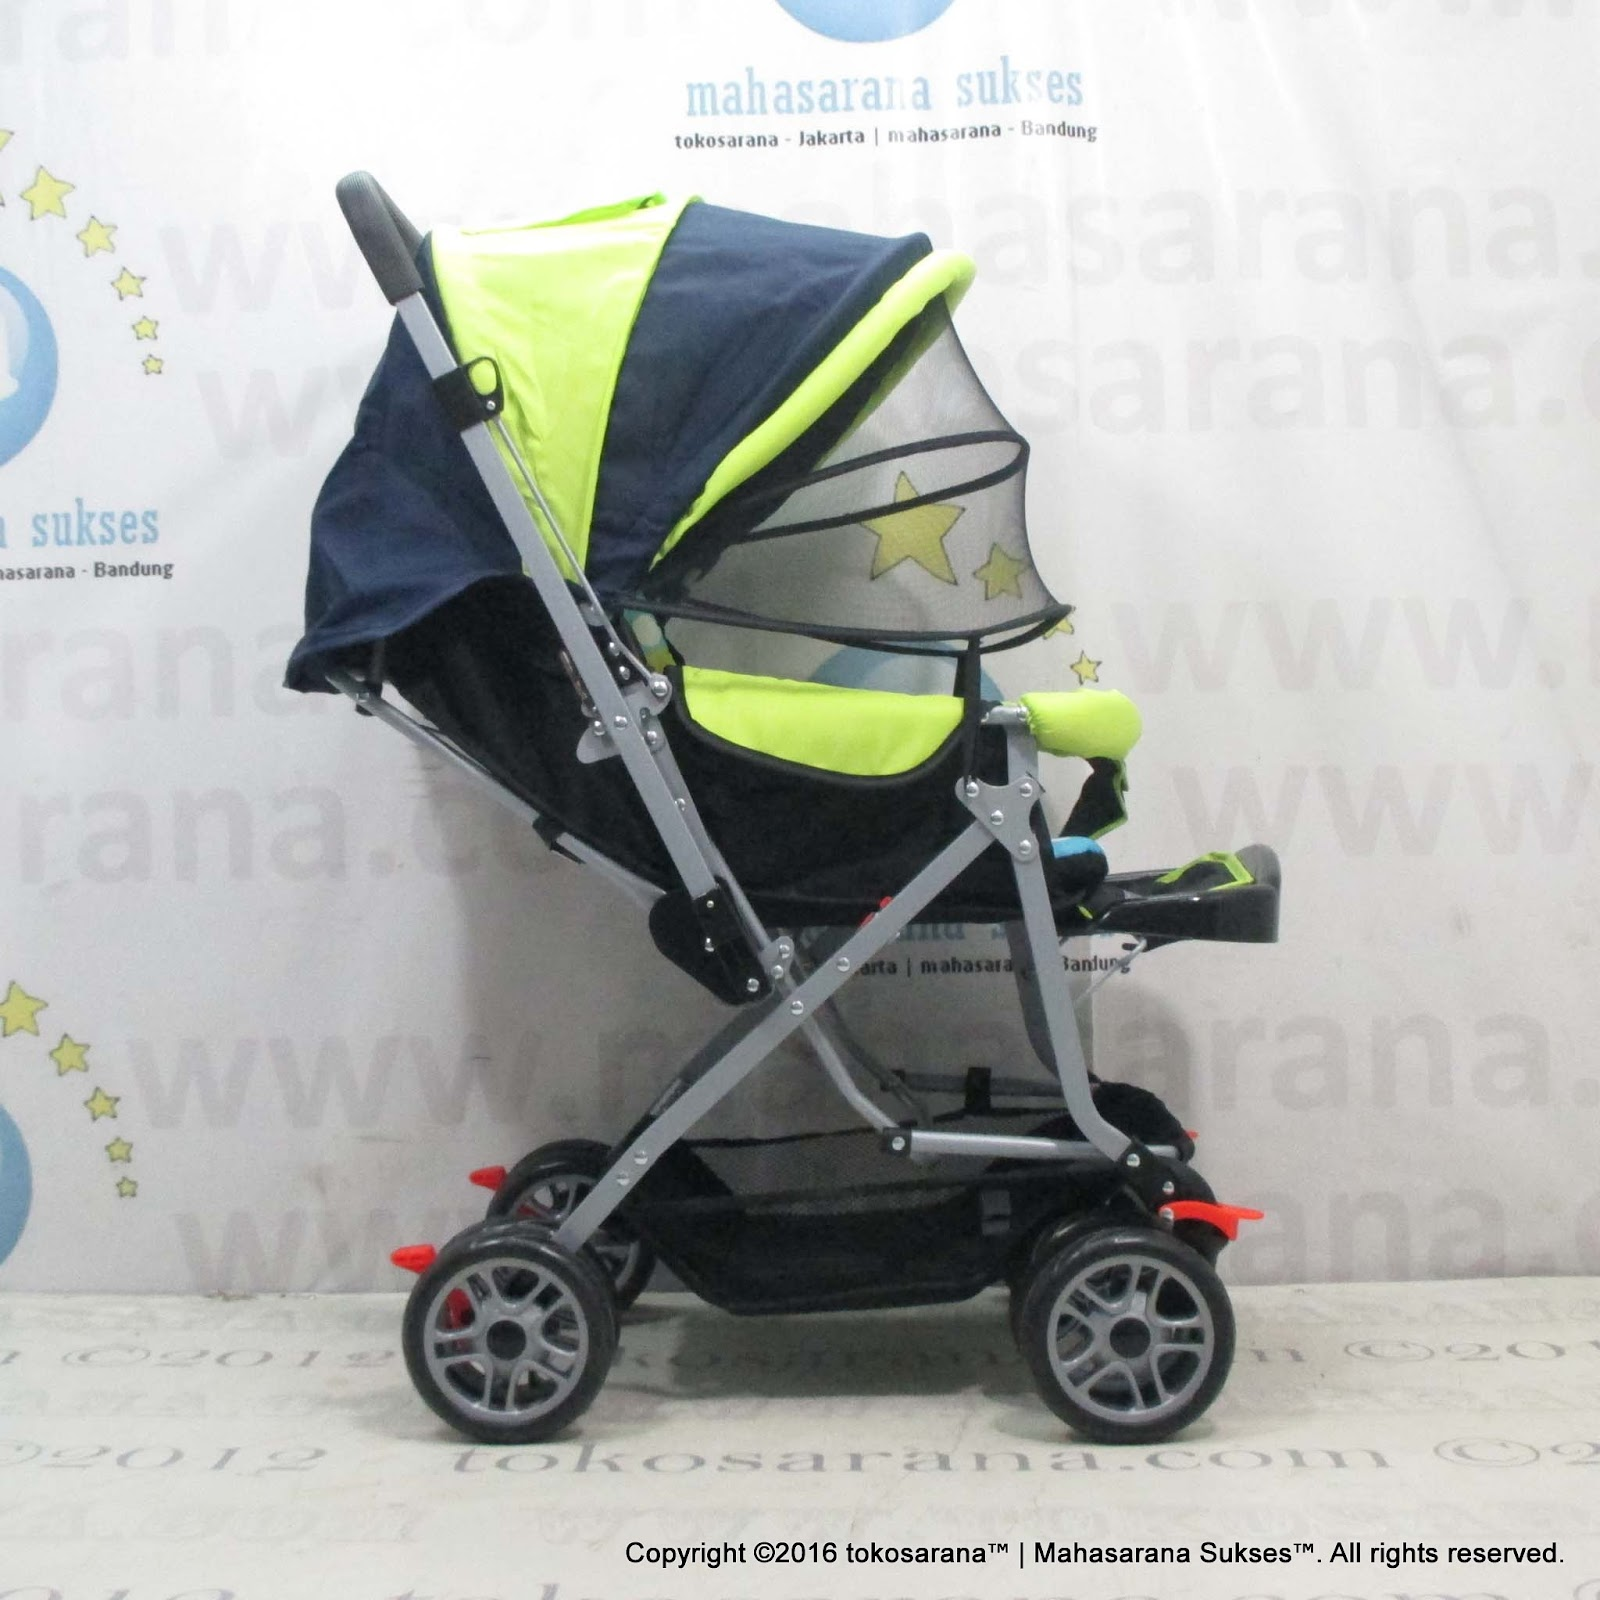 Pliko Creative Classic Baby Stroller Bs 218 Lightweight Kereta Gojek Chrisolins Chris Olins Vadso A817 Junior Labeille Dorong Bayi Like Babyelle Coco Latte 338 Boston Orange Source Bs218